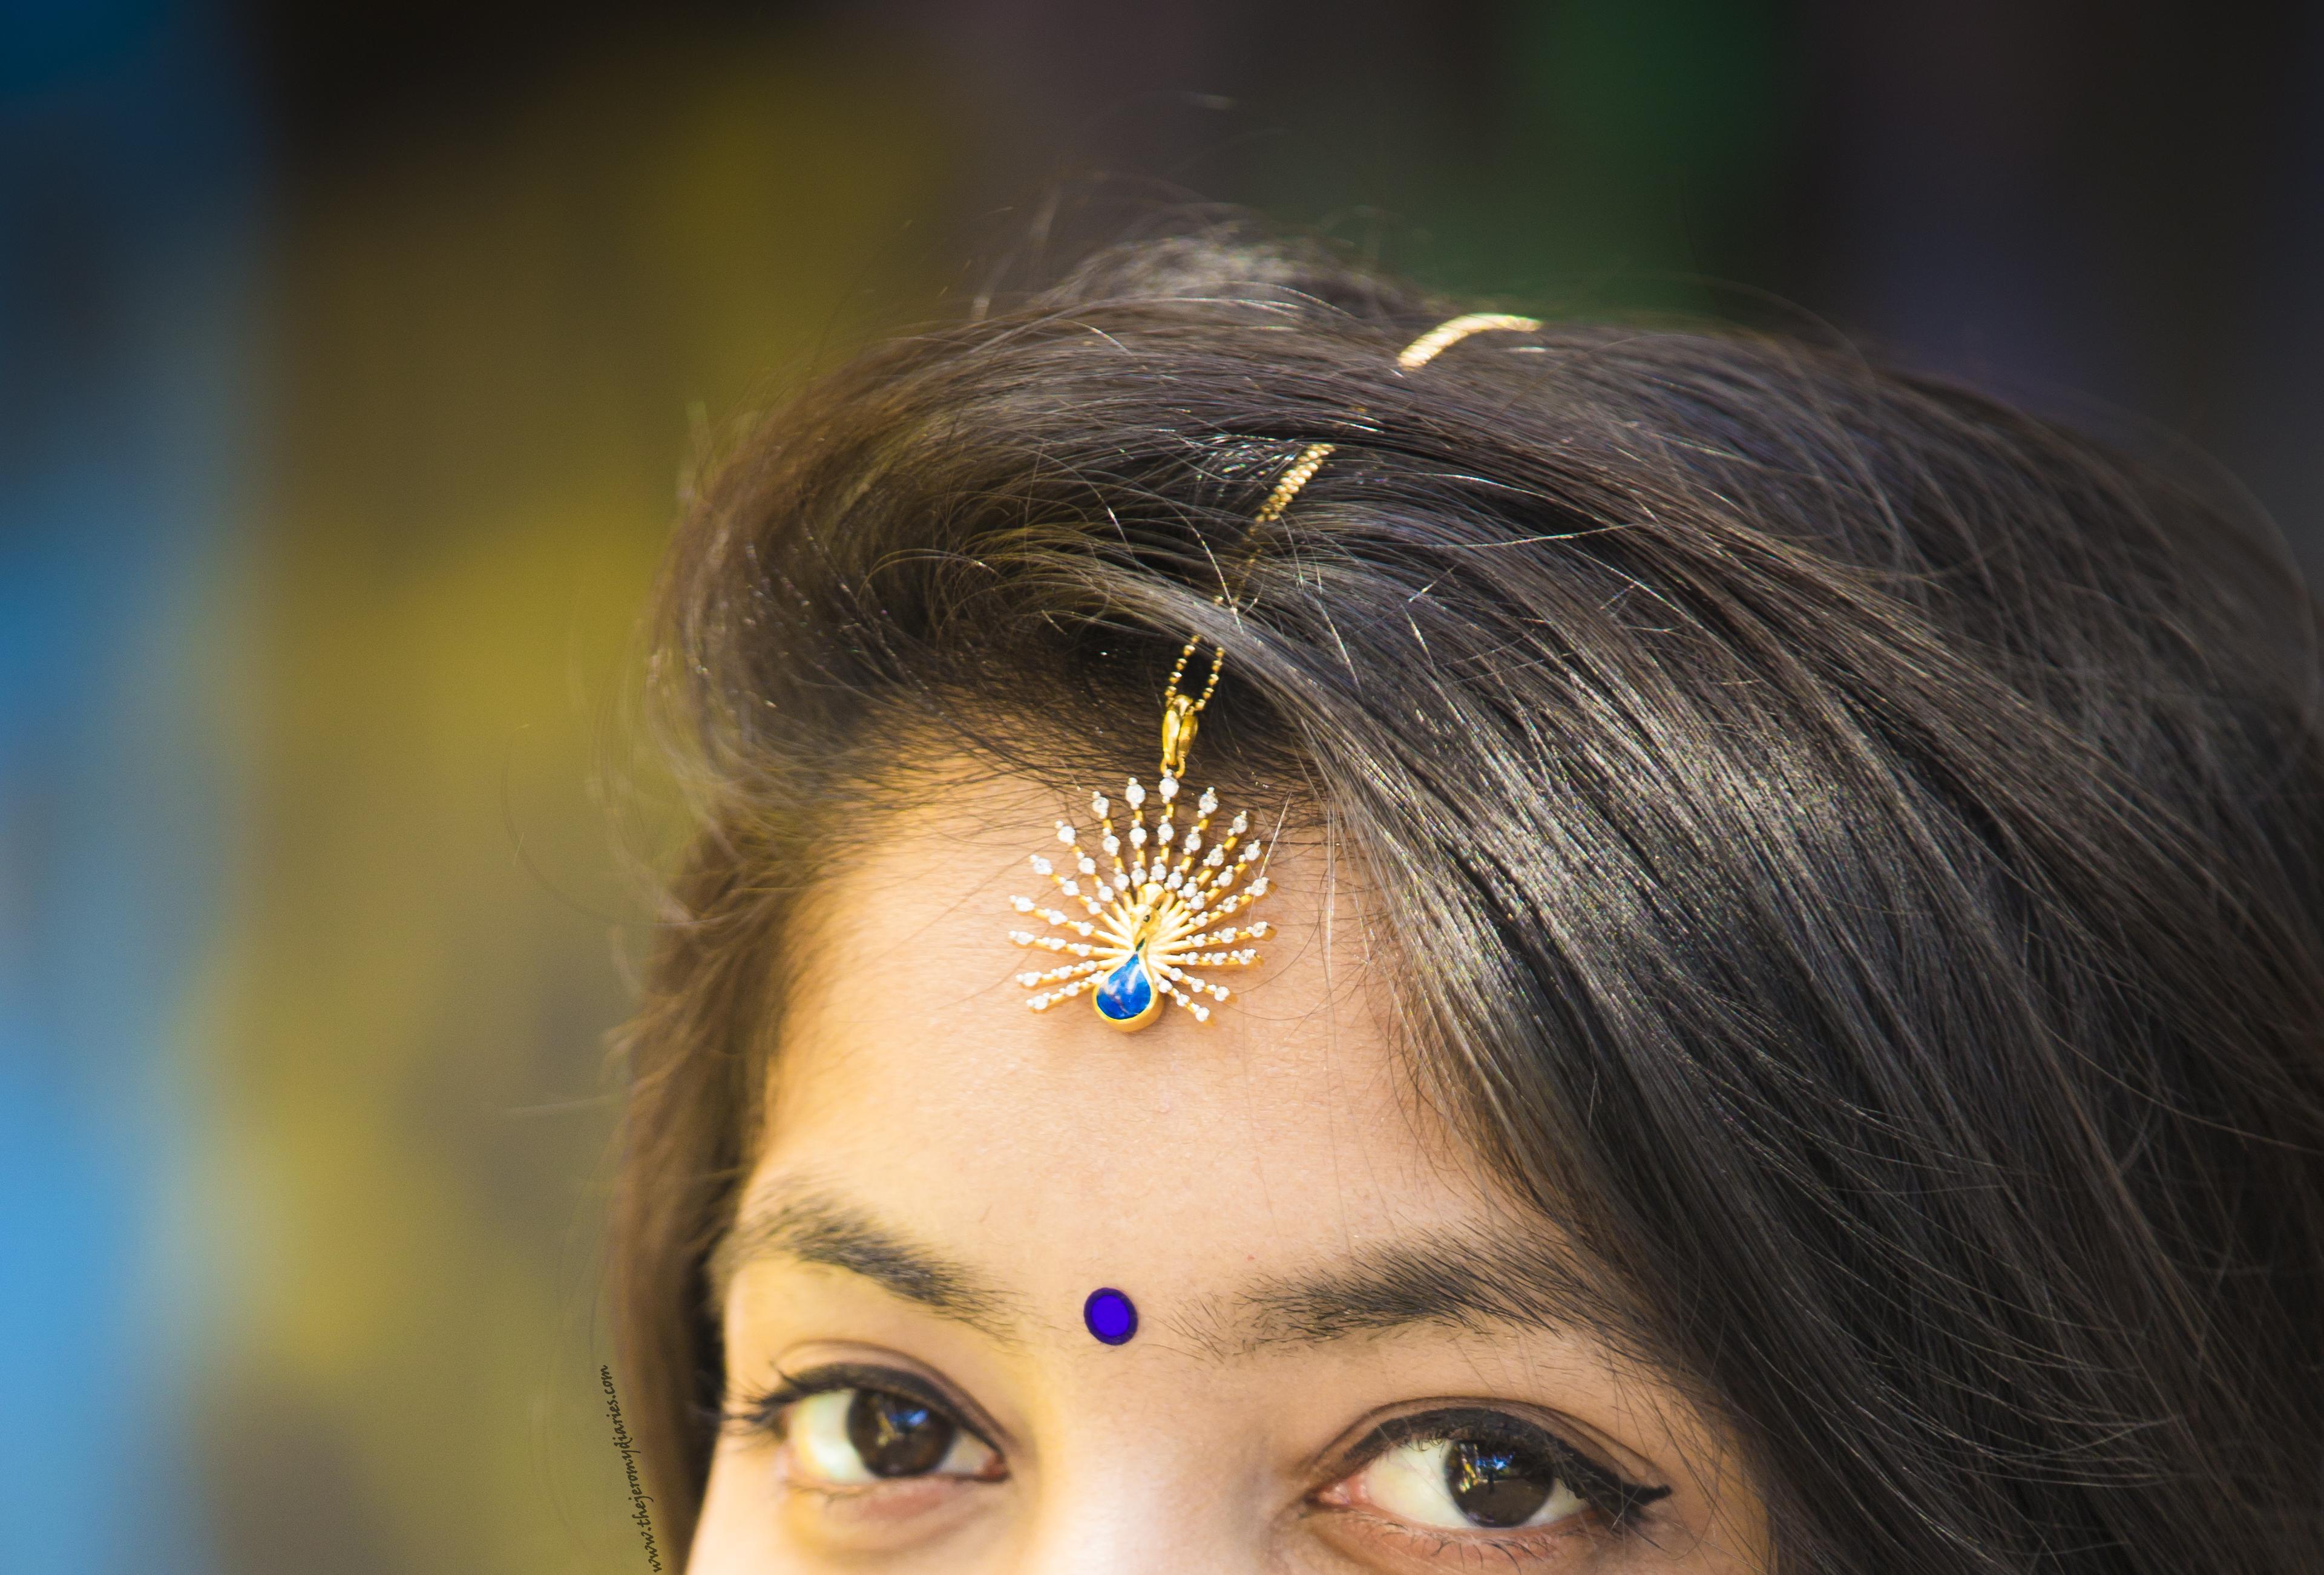 bluestone royal feather pendant as a maag tika